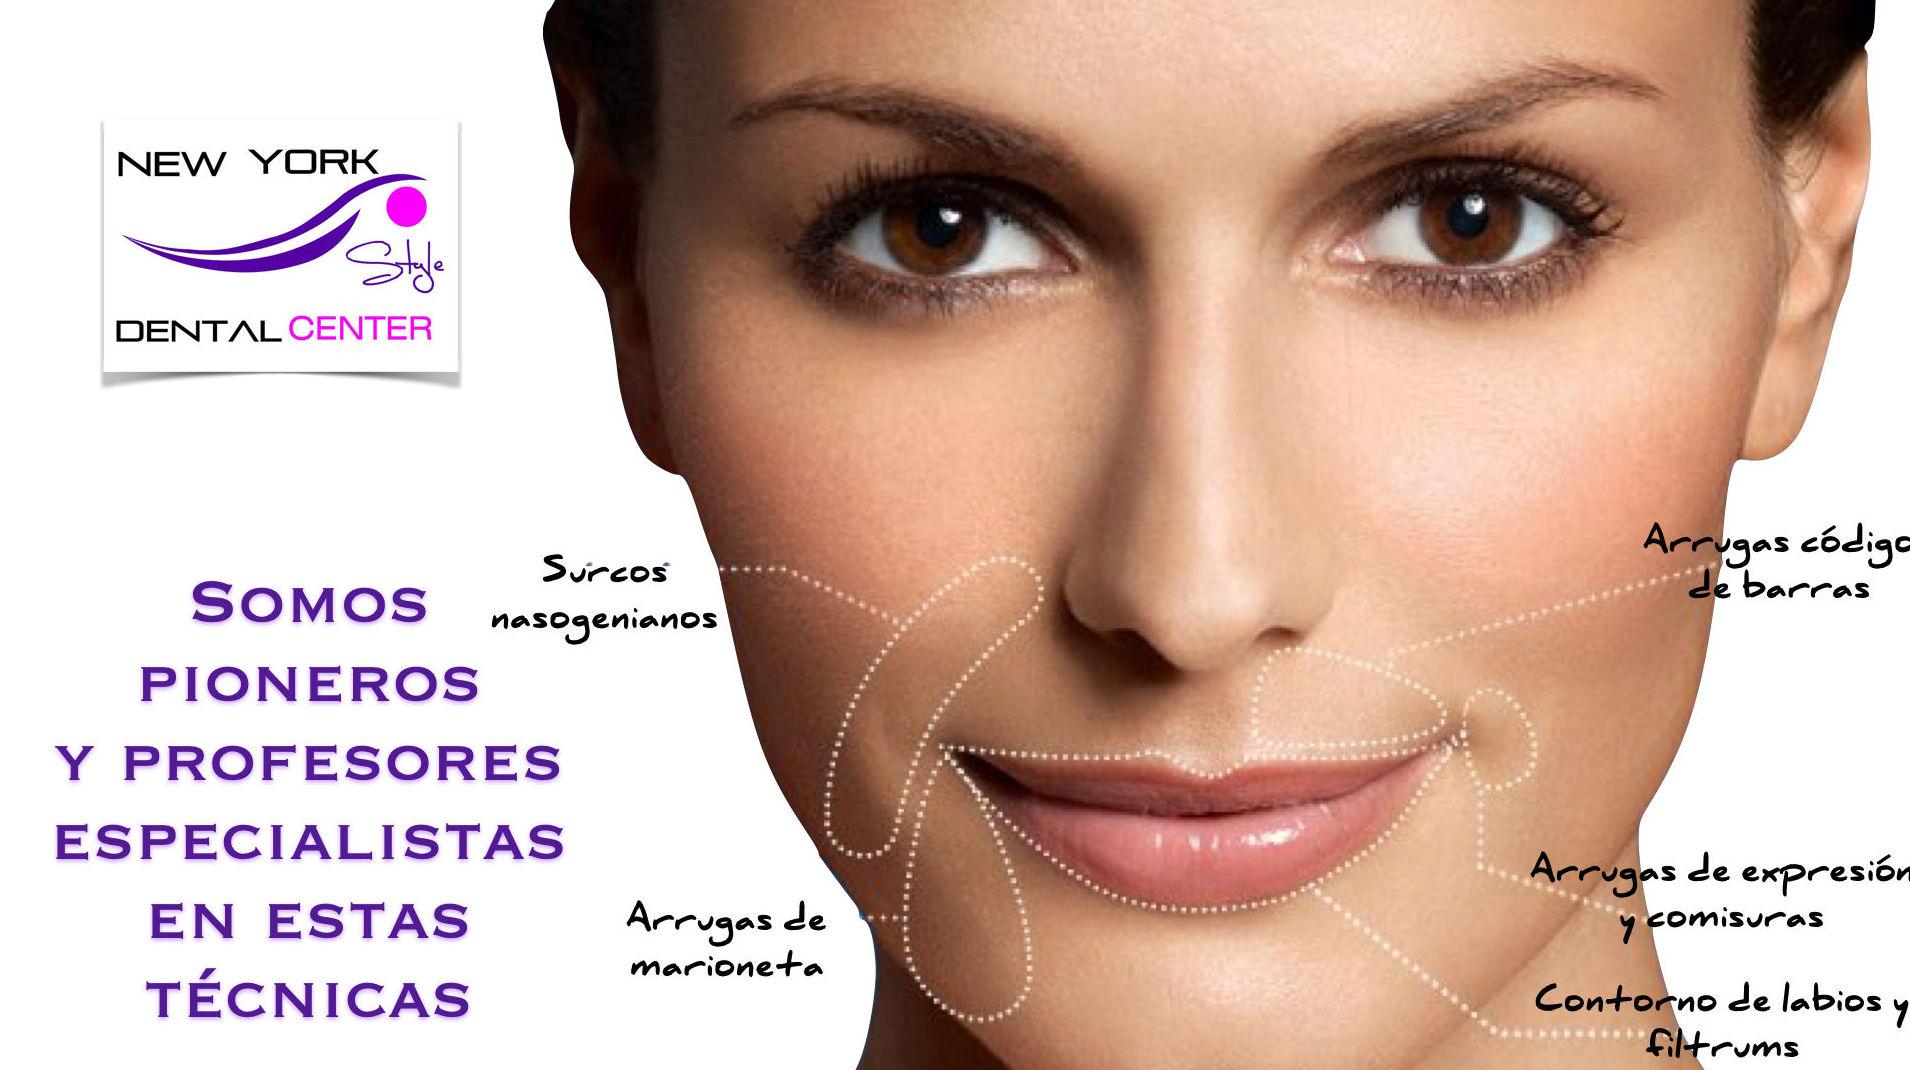 rejuvennecimiento facial